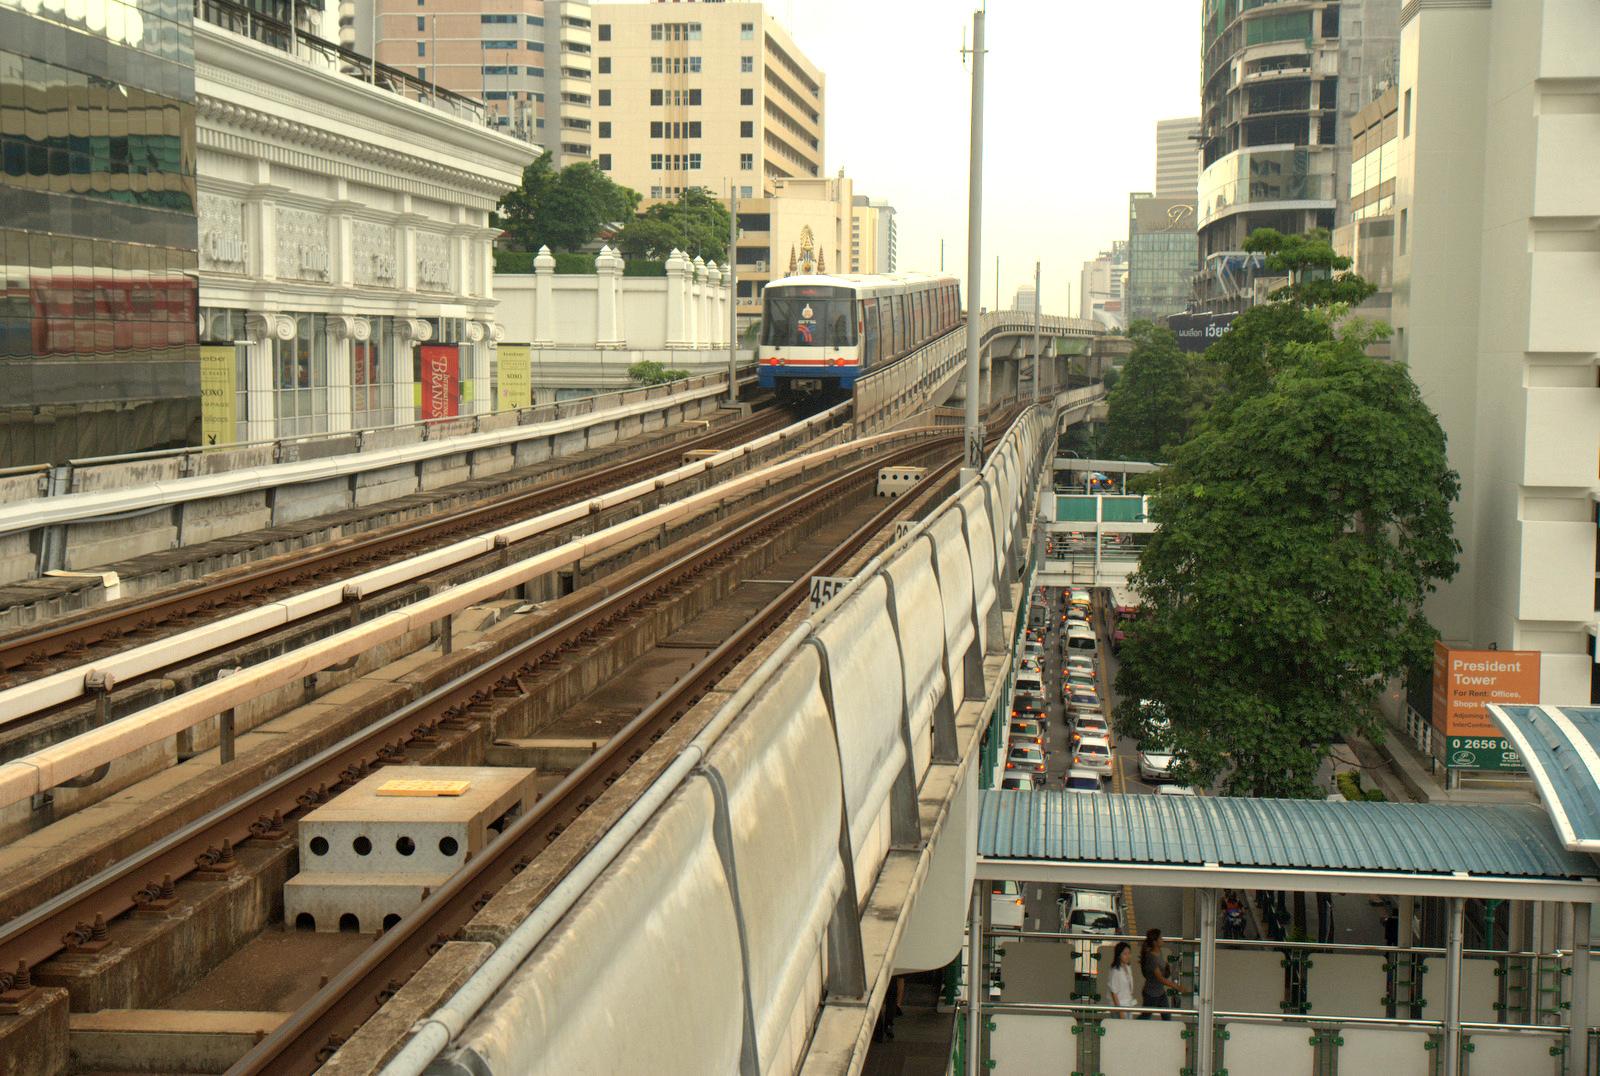 Bangkok (ostatni spacer autobusem i rzeką) 2